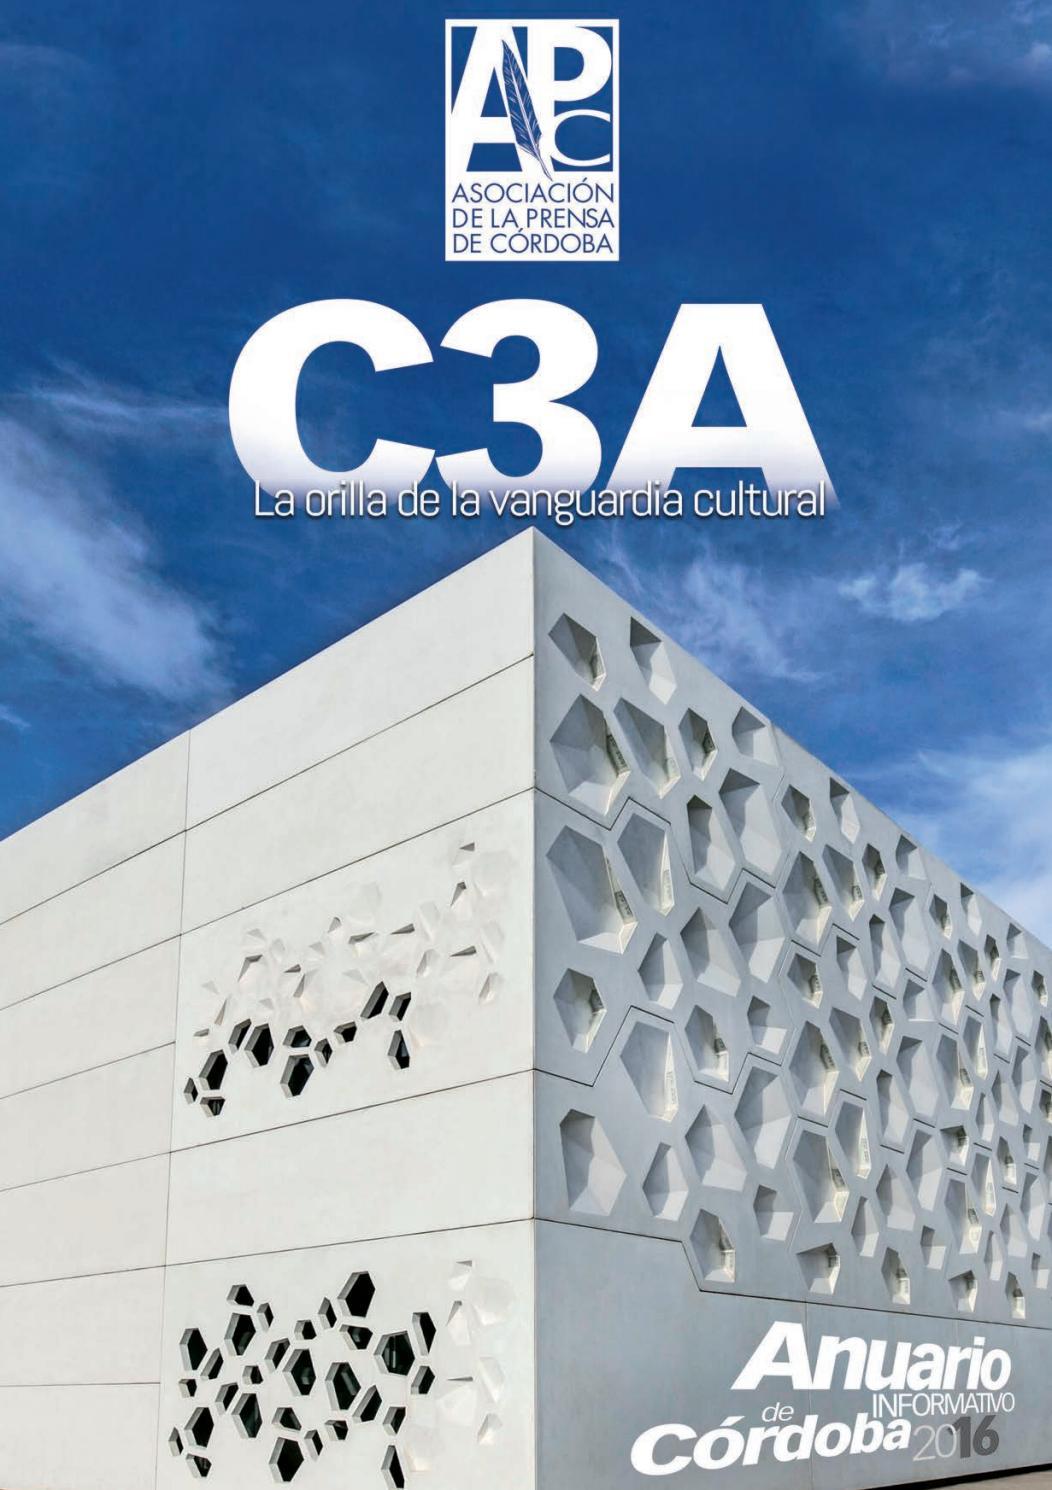 Anuario informativo de Córdoba 2016 by Asprencor - issuu